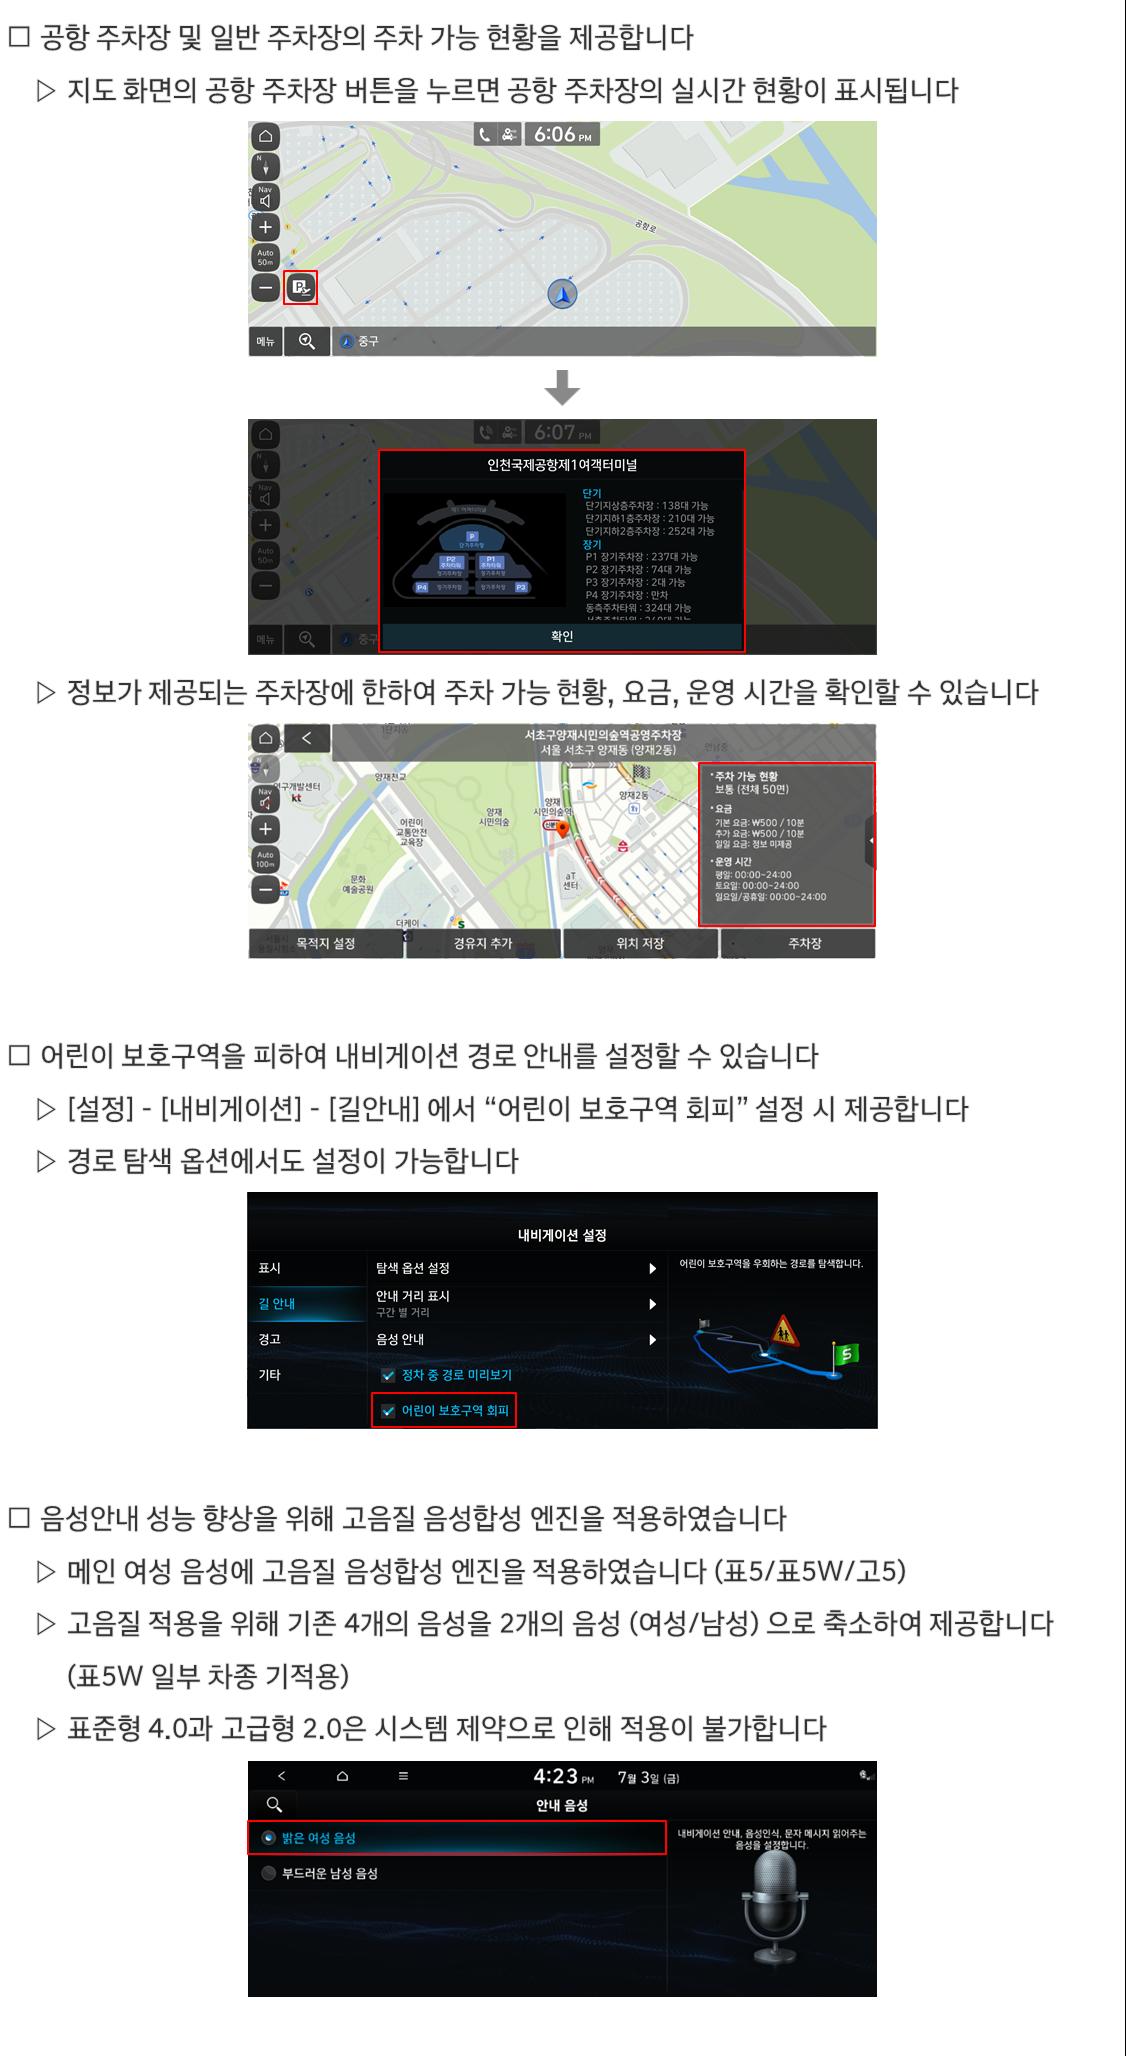 hd_04_updateinfo4.png